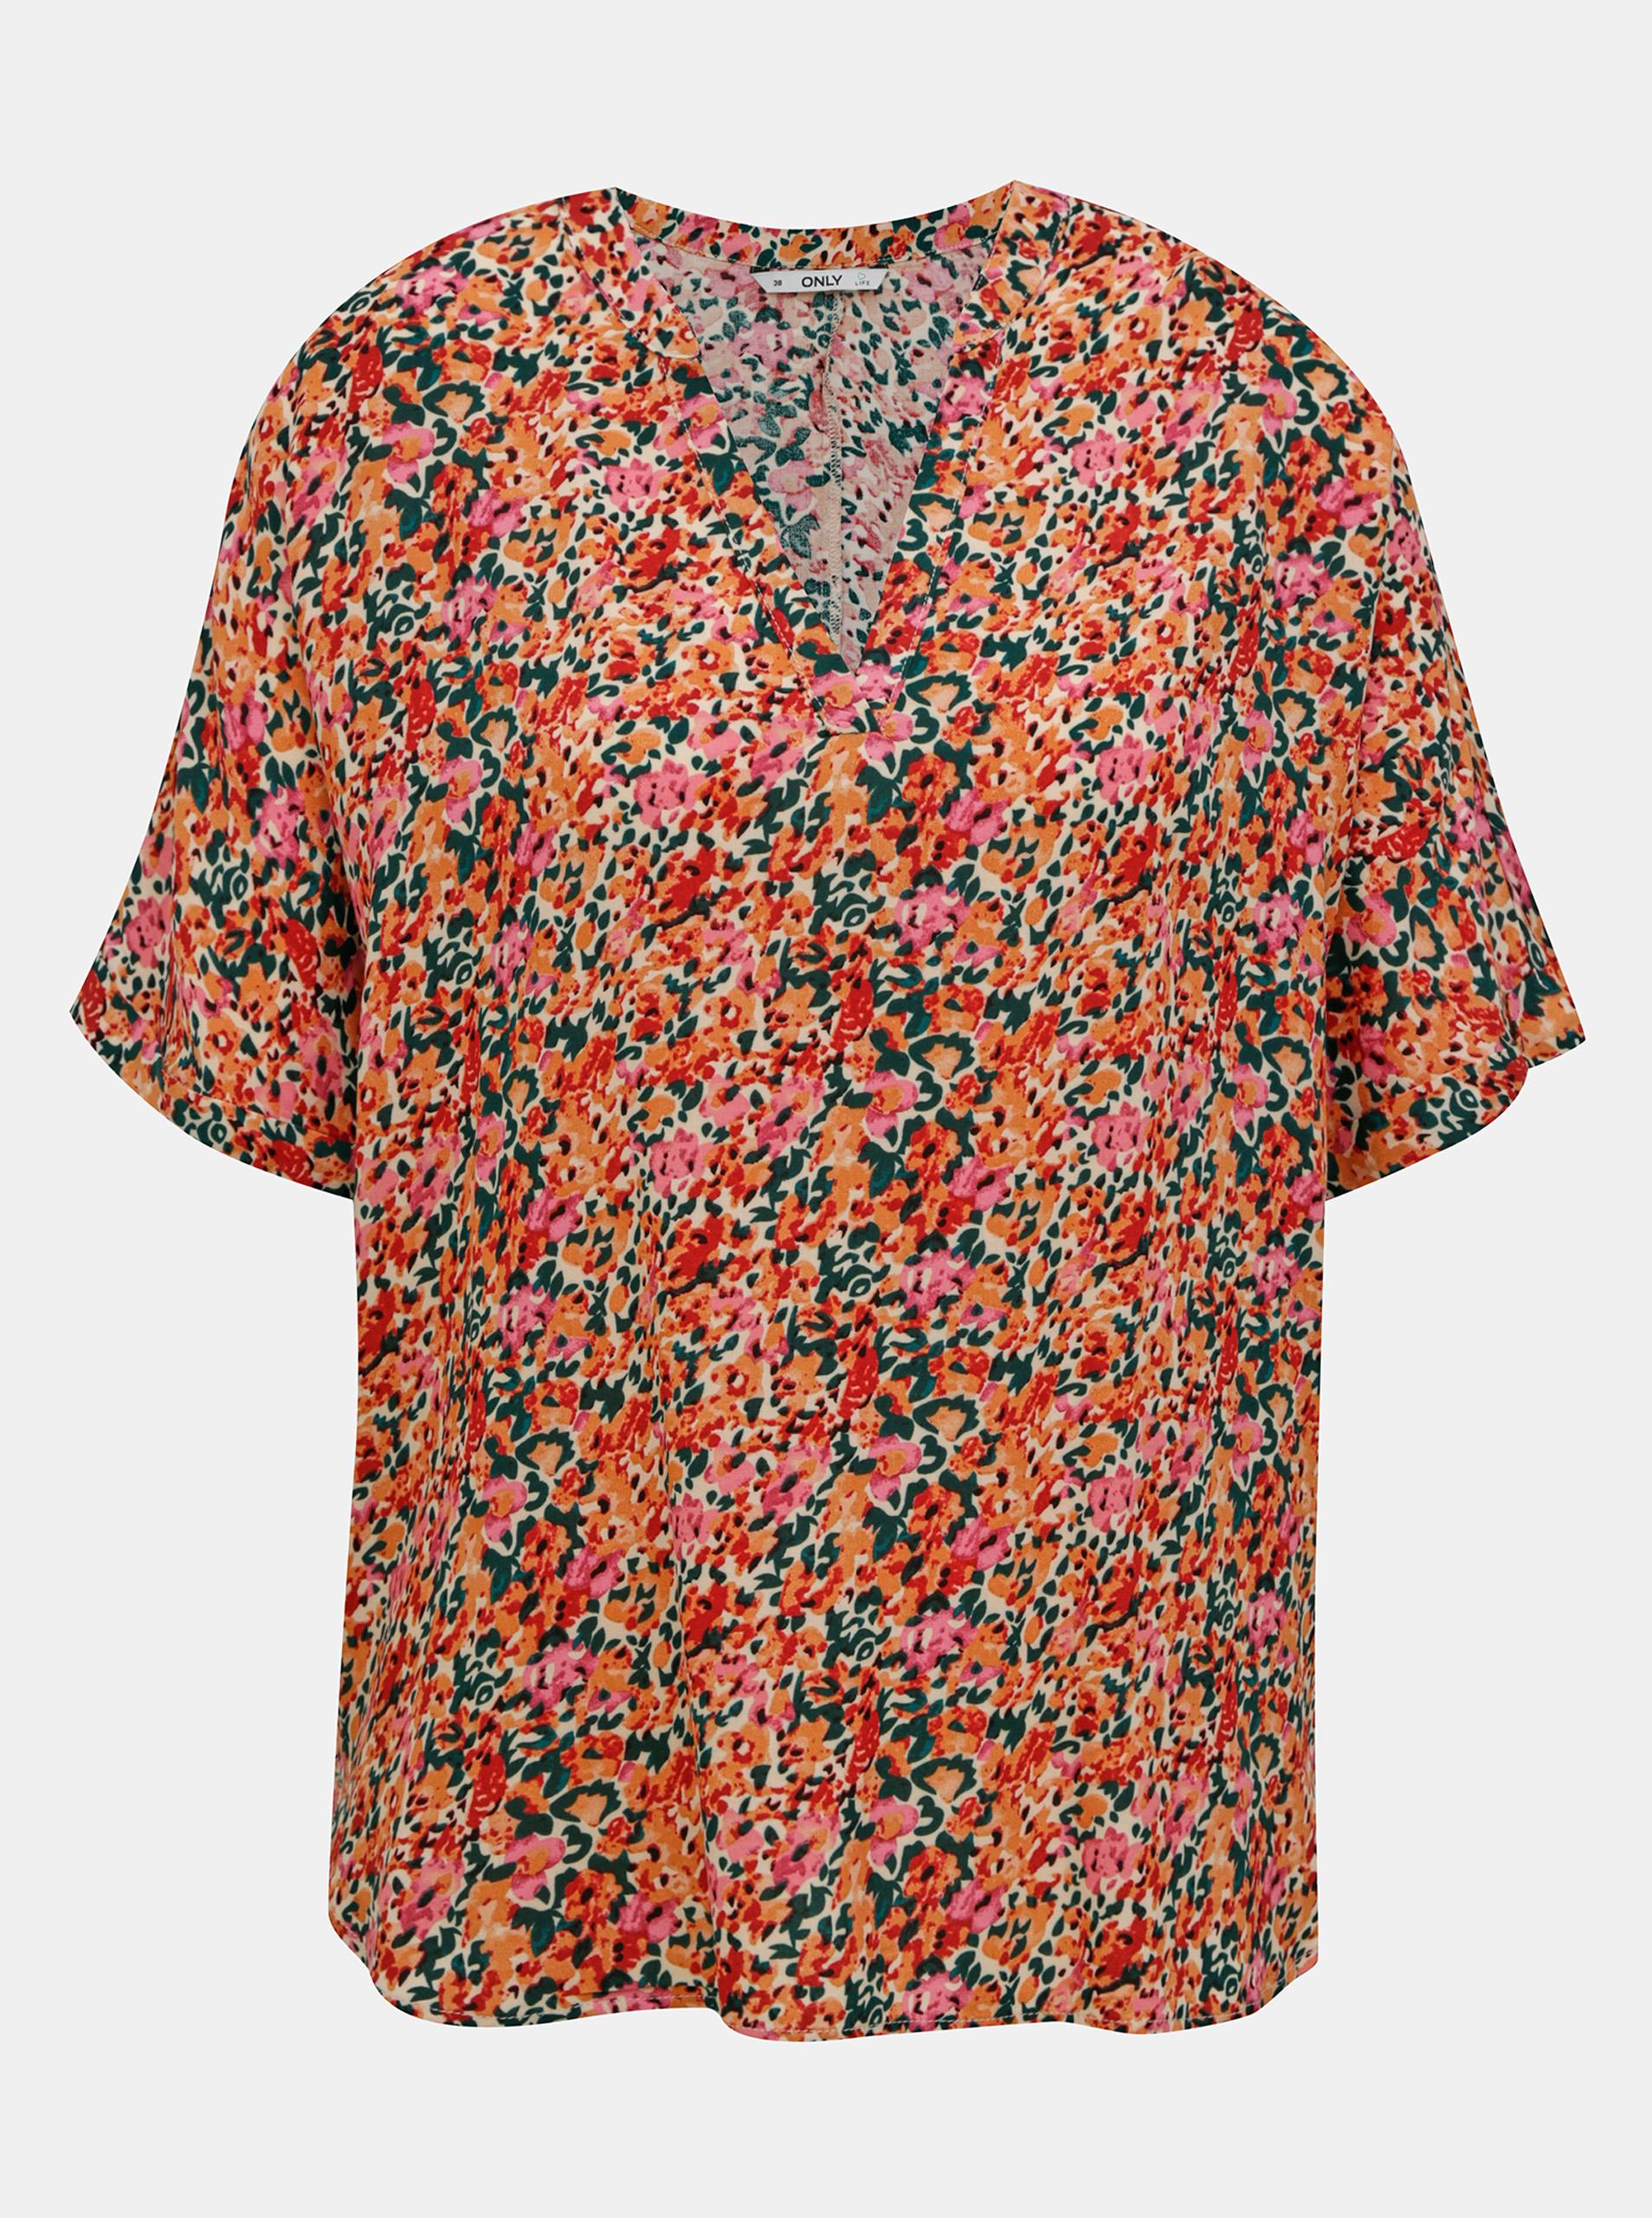 Roza-oranžno cvetoča ohlapna bluza SAMO Nova